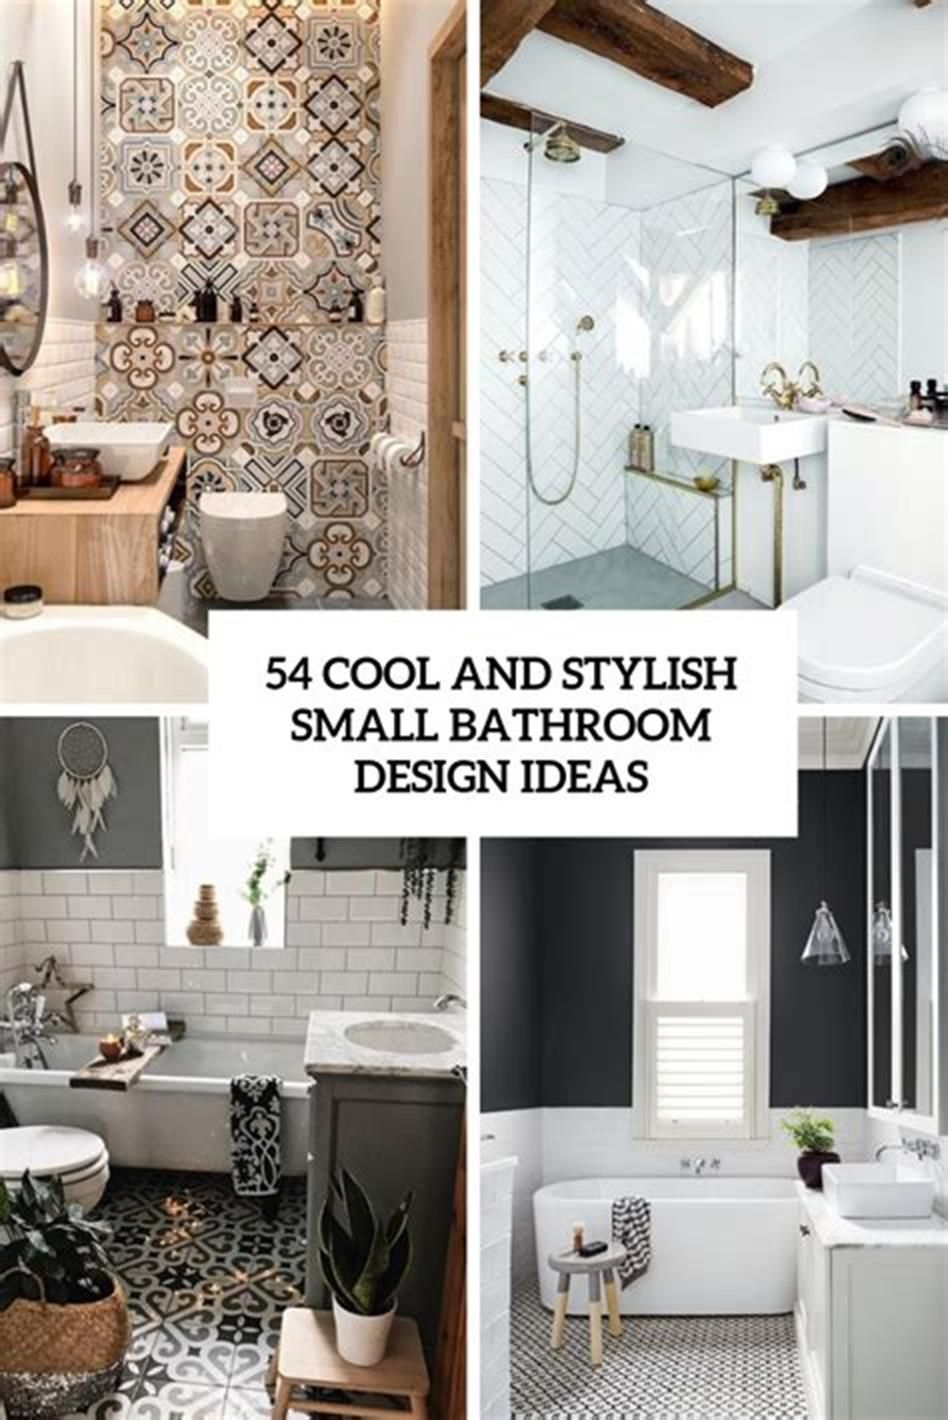 21 trendy bathroom remodeling ideas on a budget  bathroom